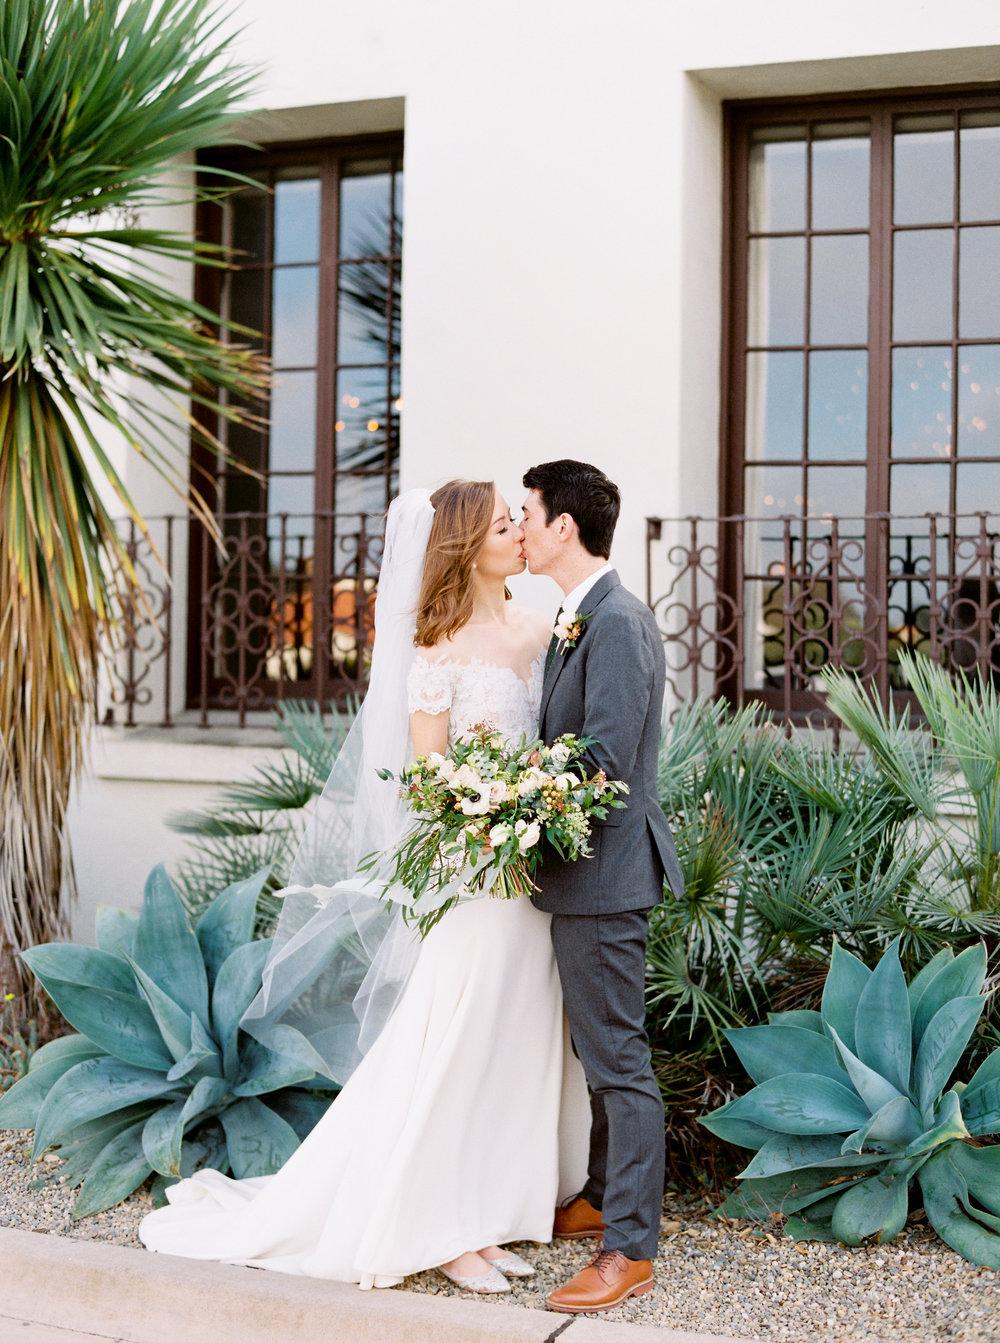 Log-cabin-wedding-in-presidio-san-francisco-california-desintation-wedding-photography-82.jpg